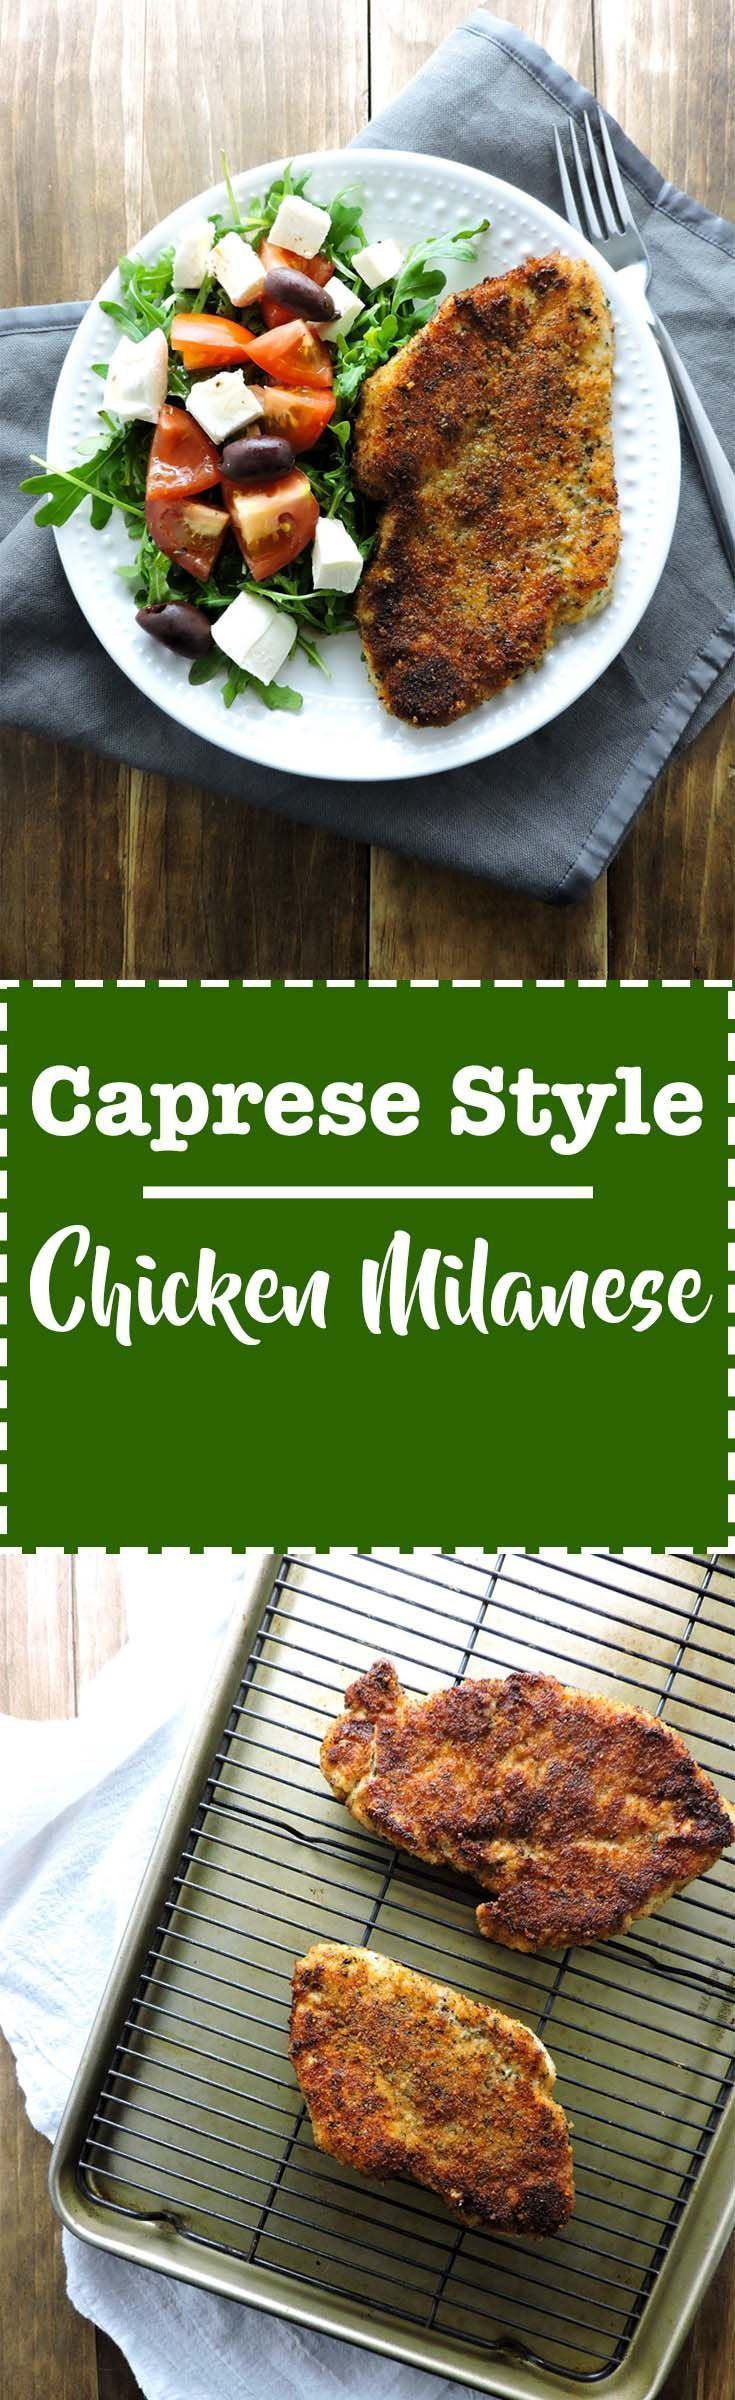 Caprese Style Chicken Milanese